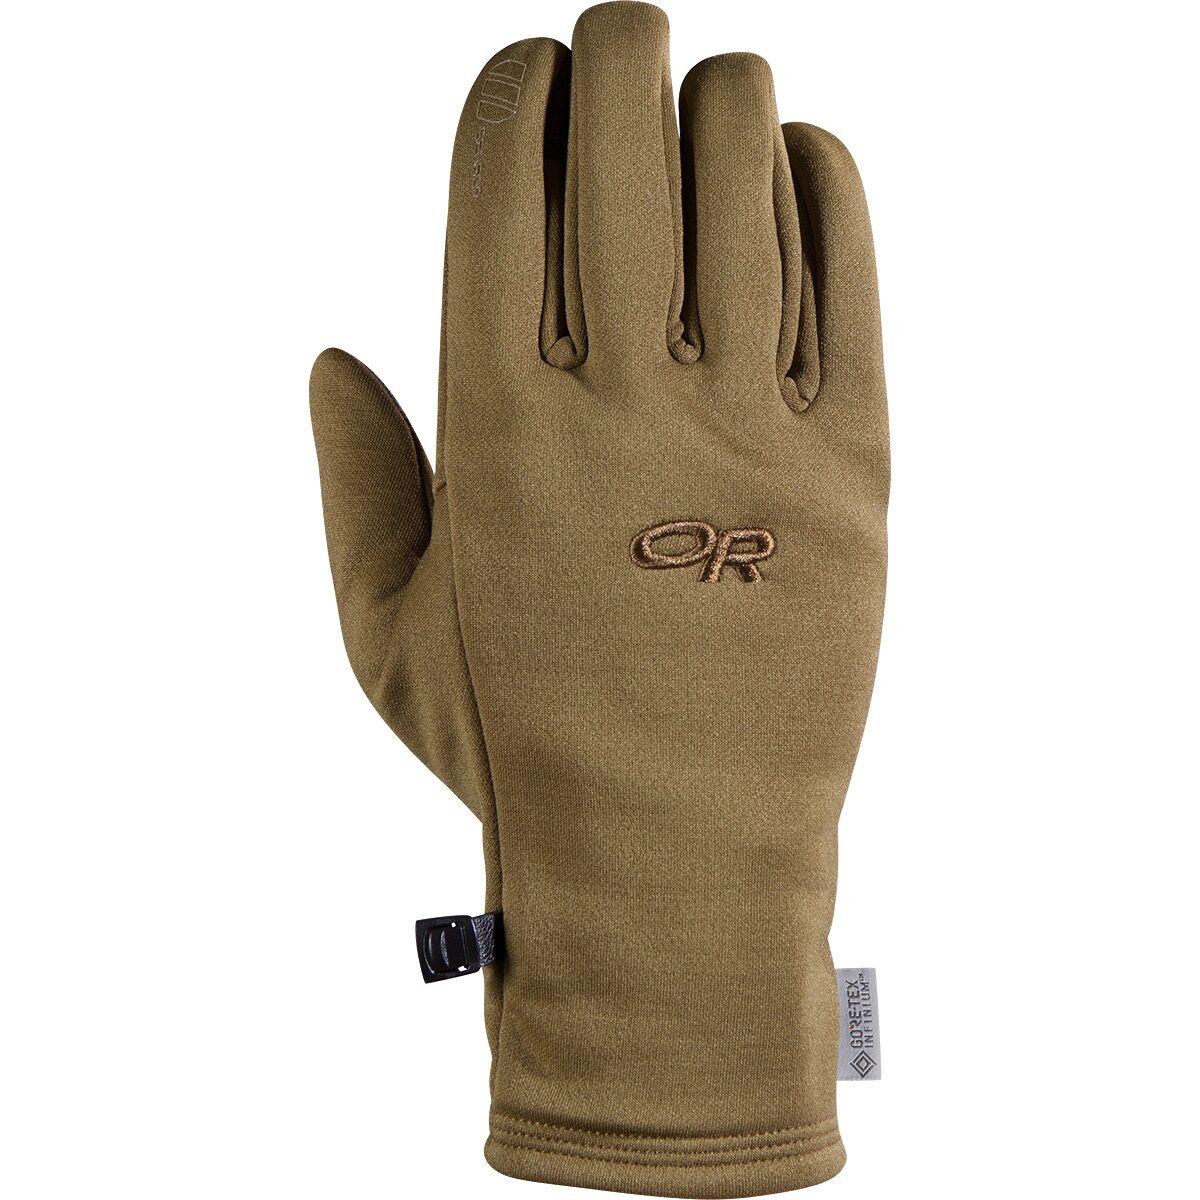 Outdoor Research Backstop Sensor Glove - Men